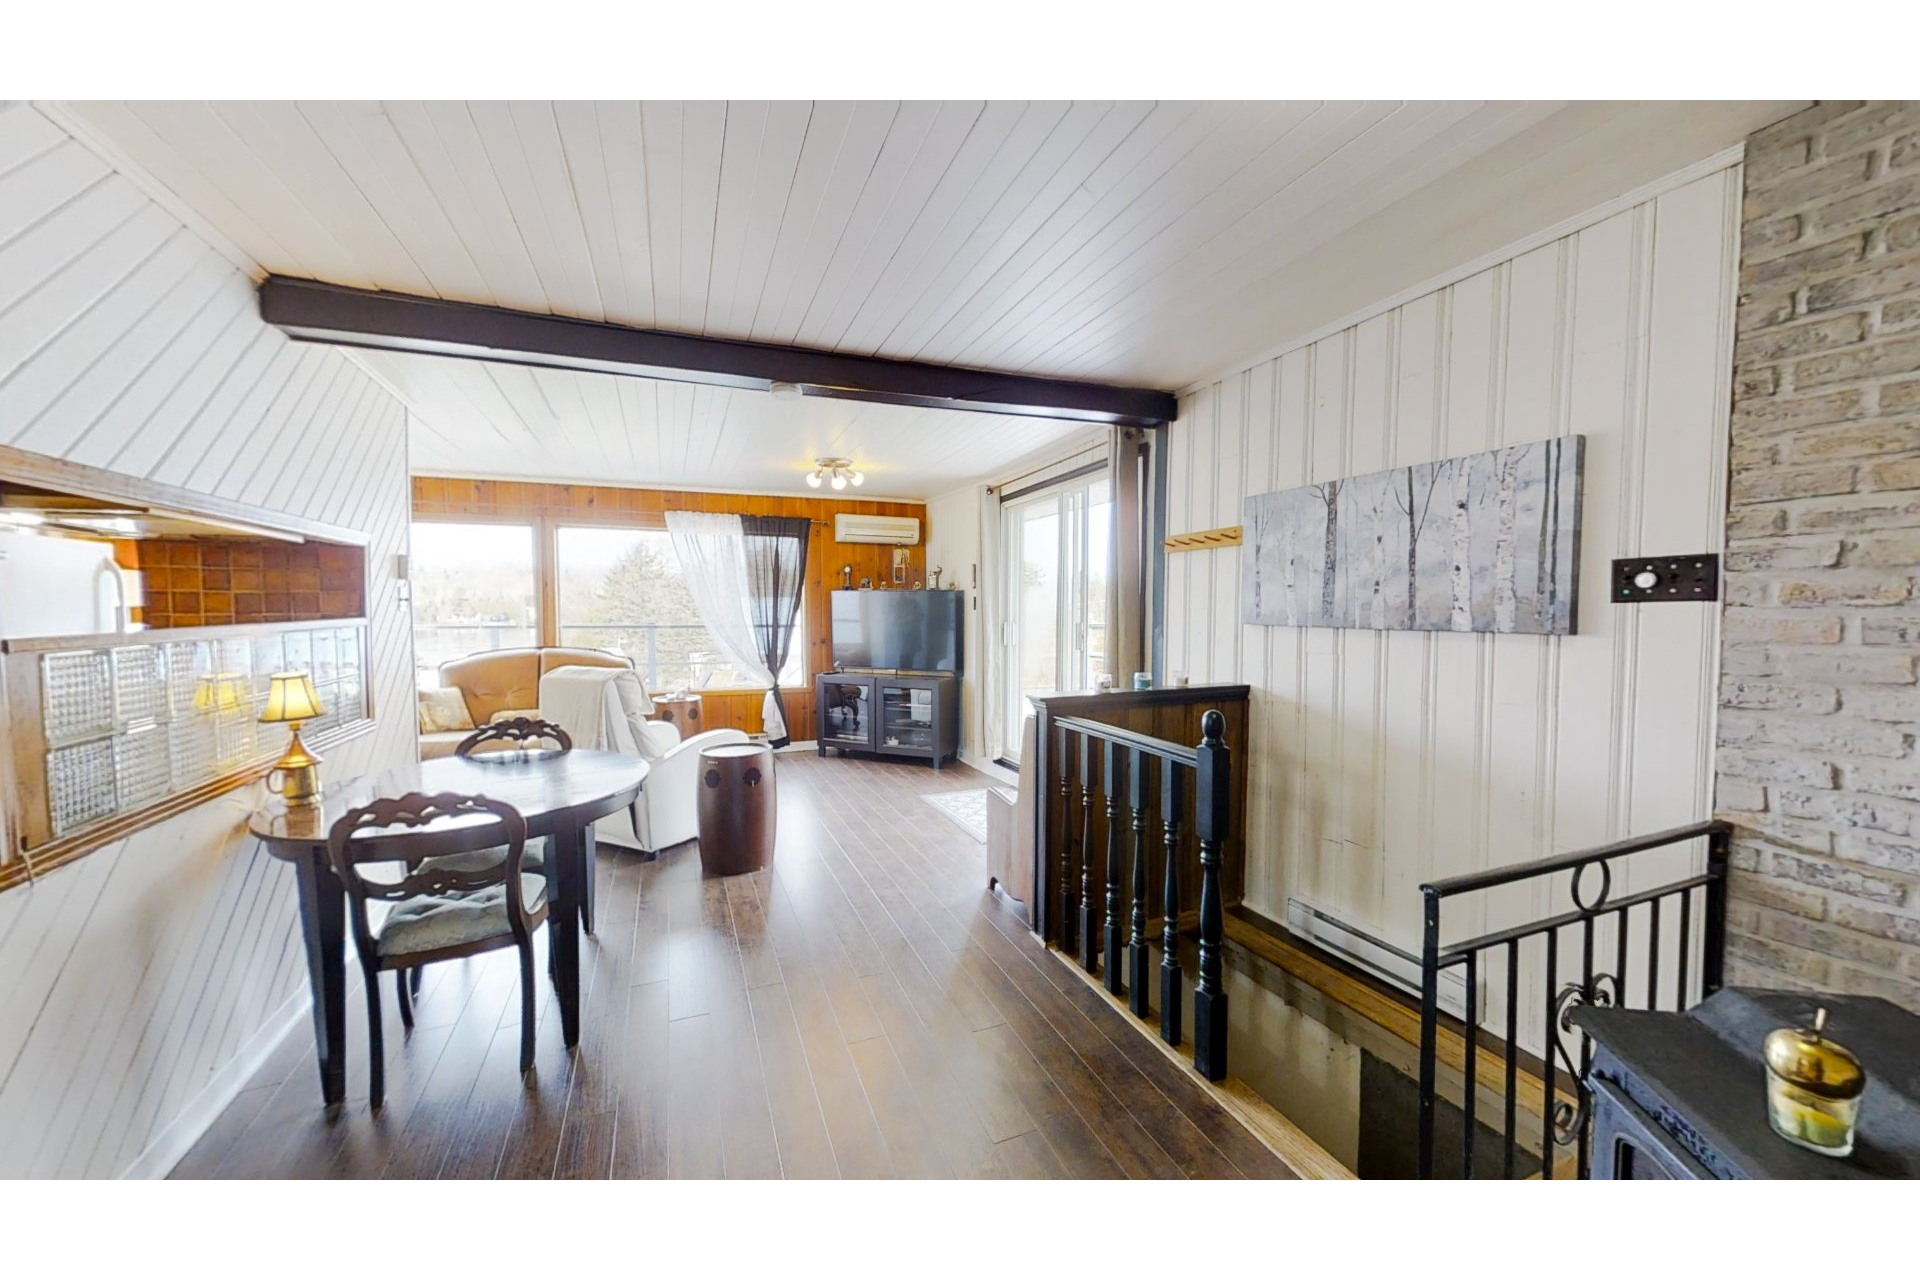 image 3 - House For sale Saint-Calixte - 7 rooms